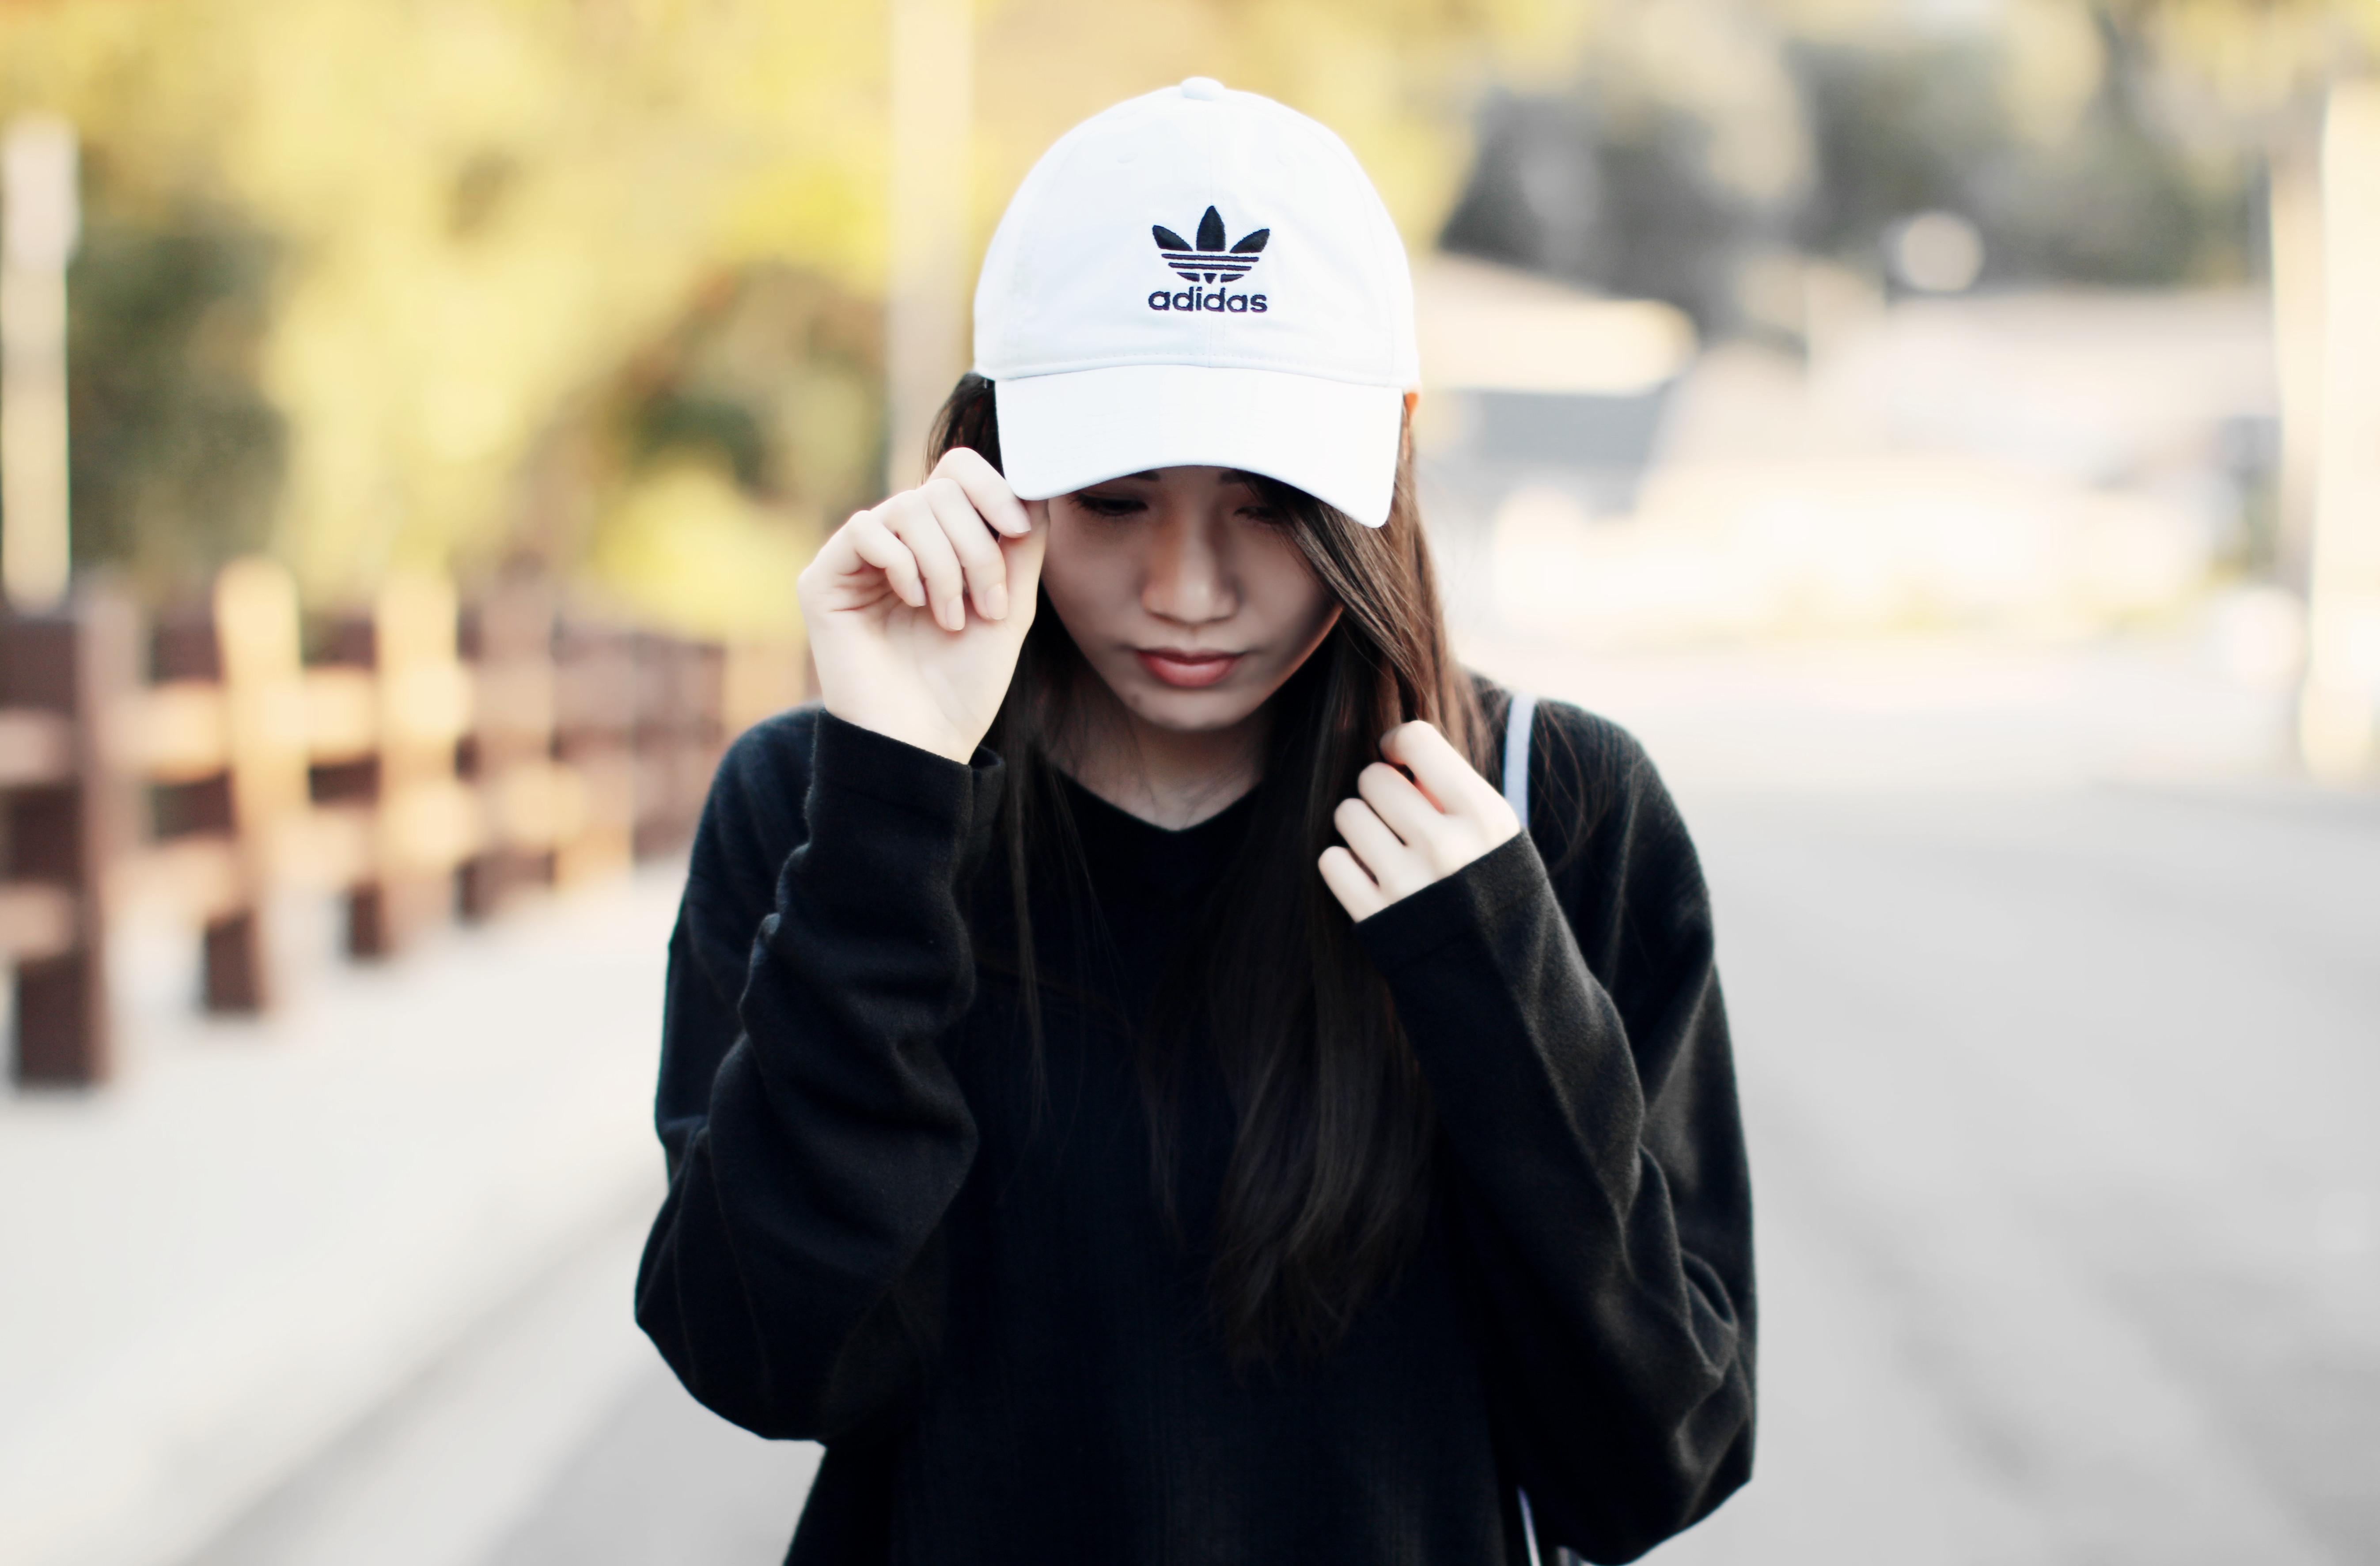 4370-ootd-fashion-style-outfitoftheday-wiwt-streetstyle-adidas-urbanoutfitters-hm-f21xme-nike-elizabeeetht-clothestoyouuu